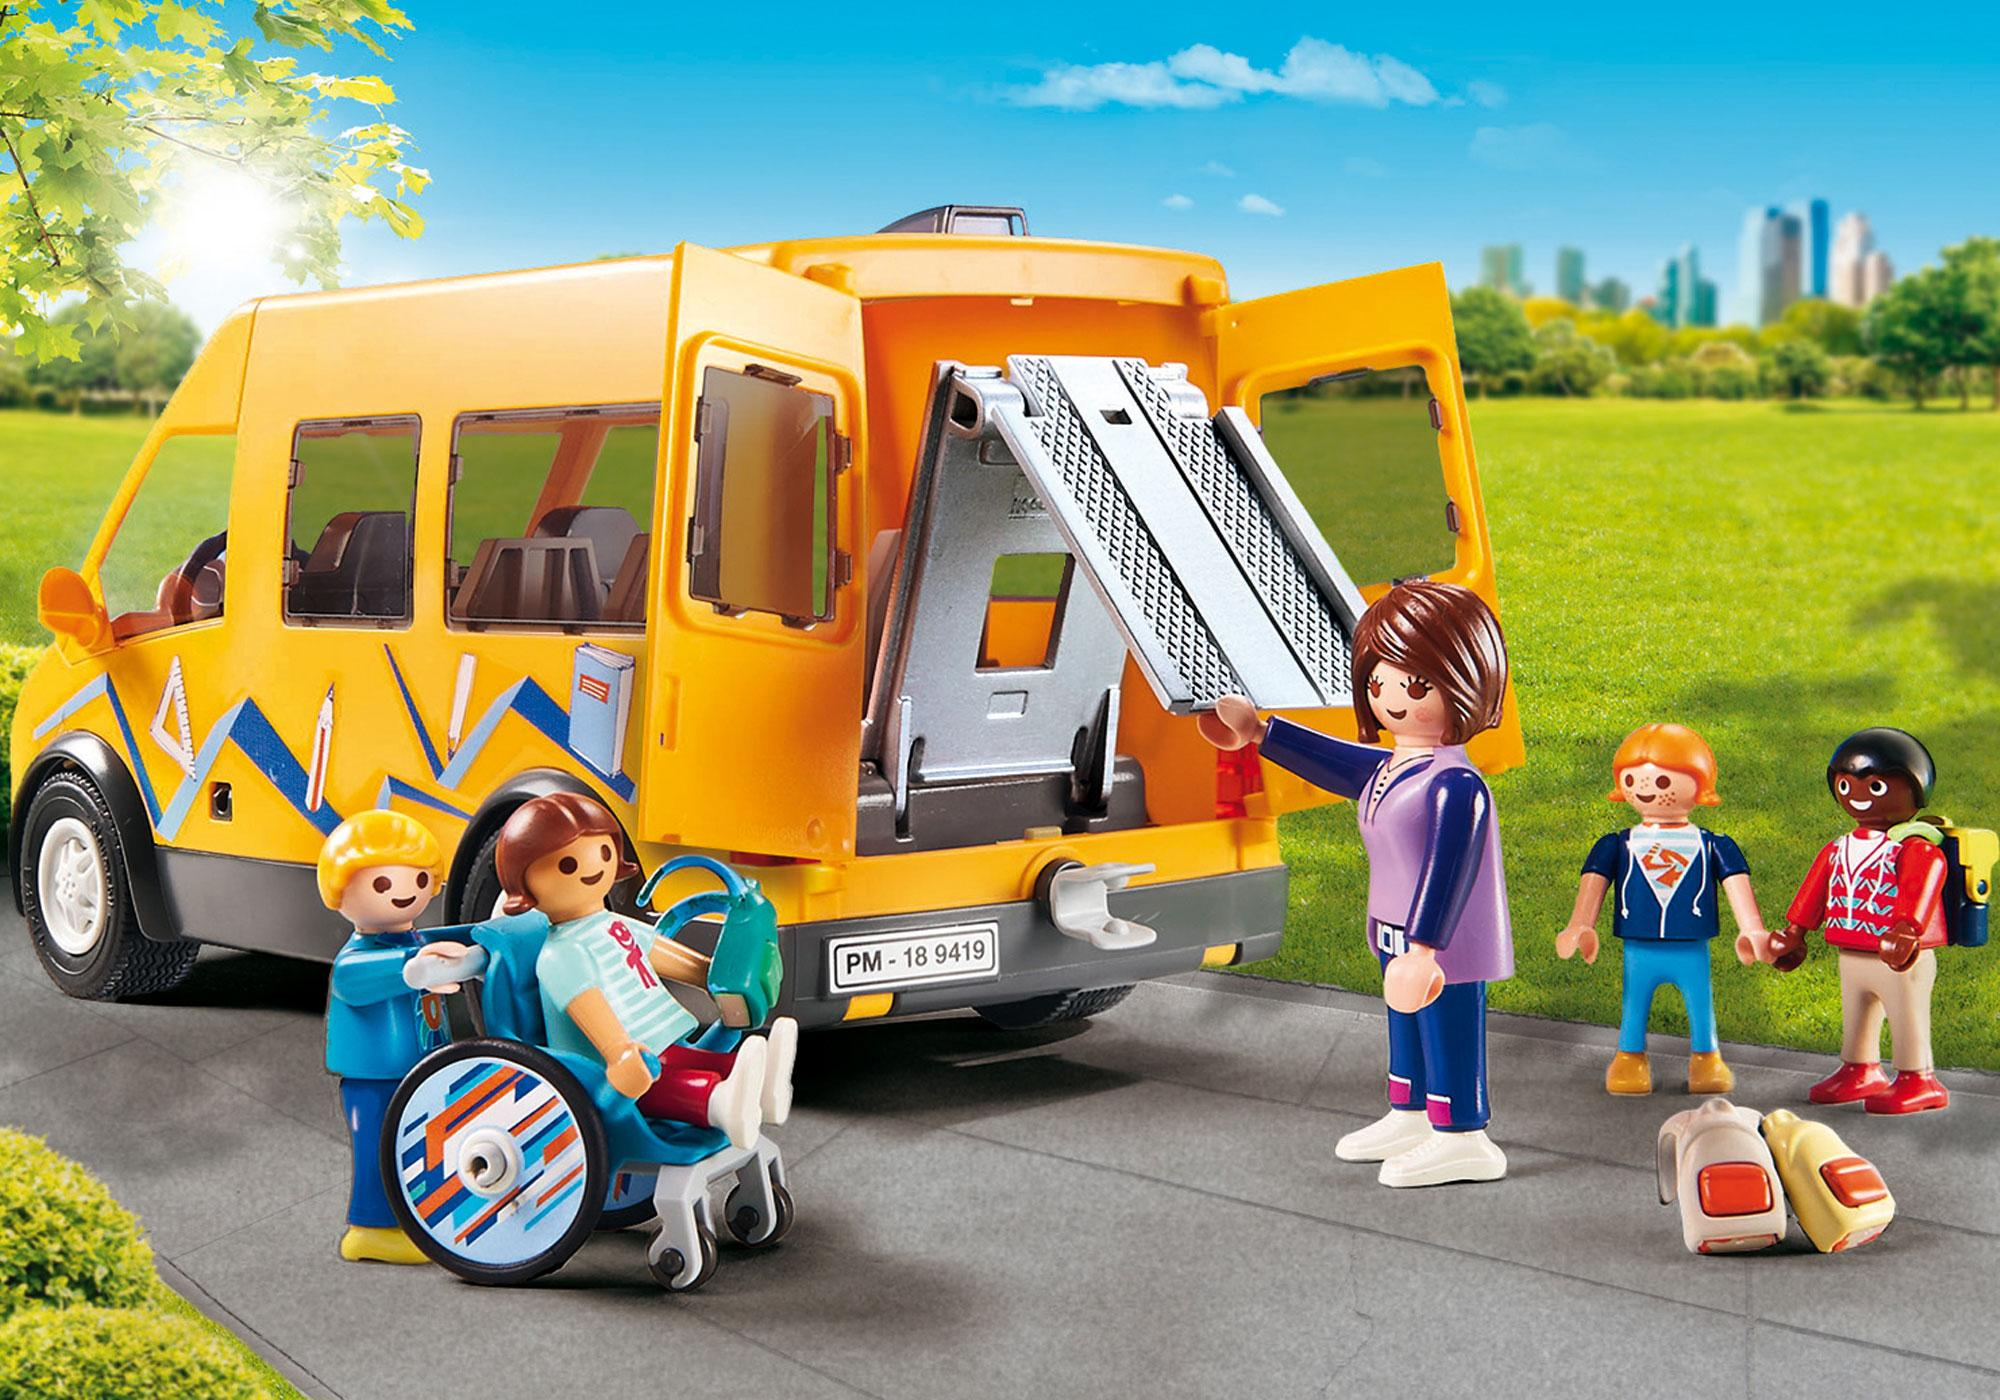 http://media.playmobil.com/i/playmobil/9419_product_extra2/Schoolbus